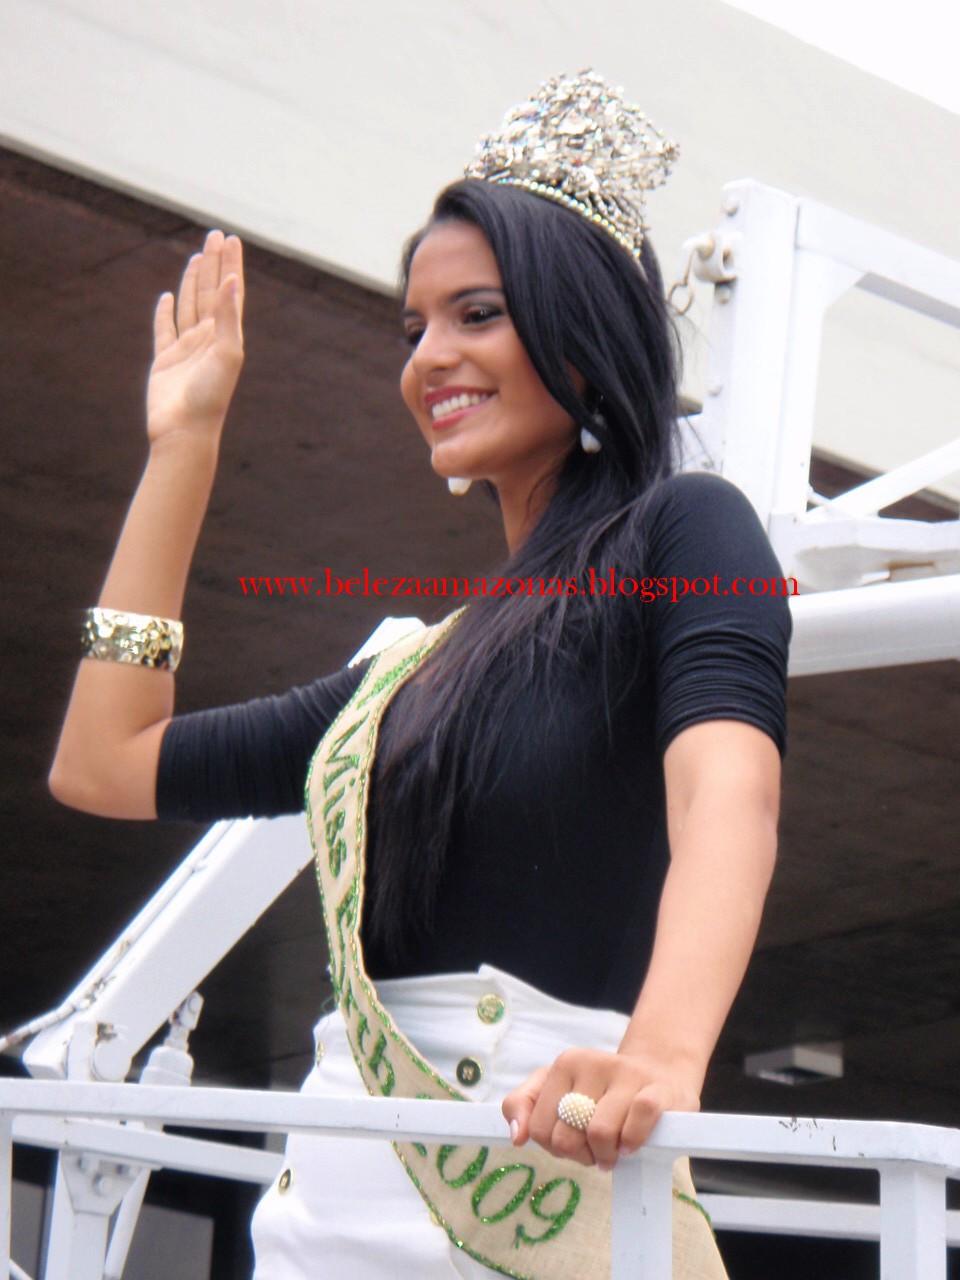 ☻♠☼ Galeria de Larissa Ramos, Miss Earth 2009.☻♠☼ - Página 5 Miss%2Bterra%2Bbrasil%2Bmiss%2Bearth%2B2009%2BLarissa%2BRamos%2BBeleza%2BAmazonas%2B027